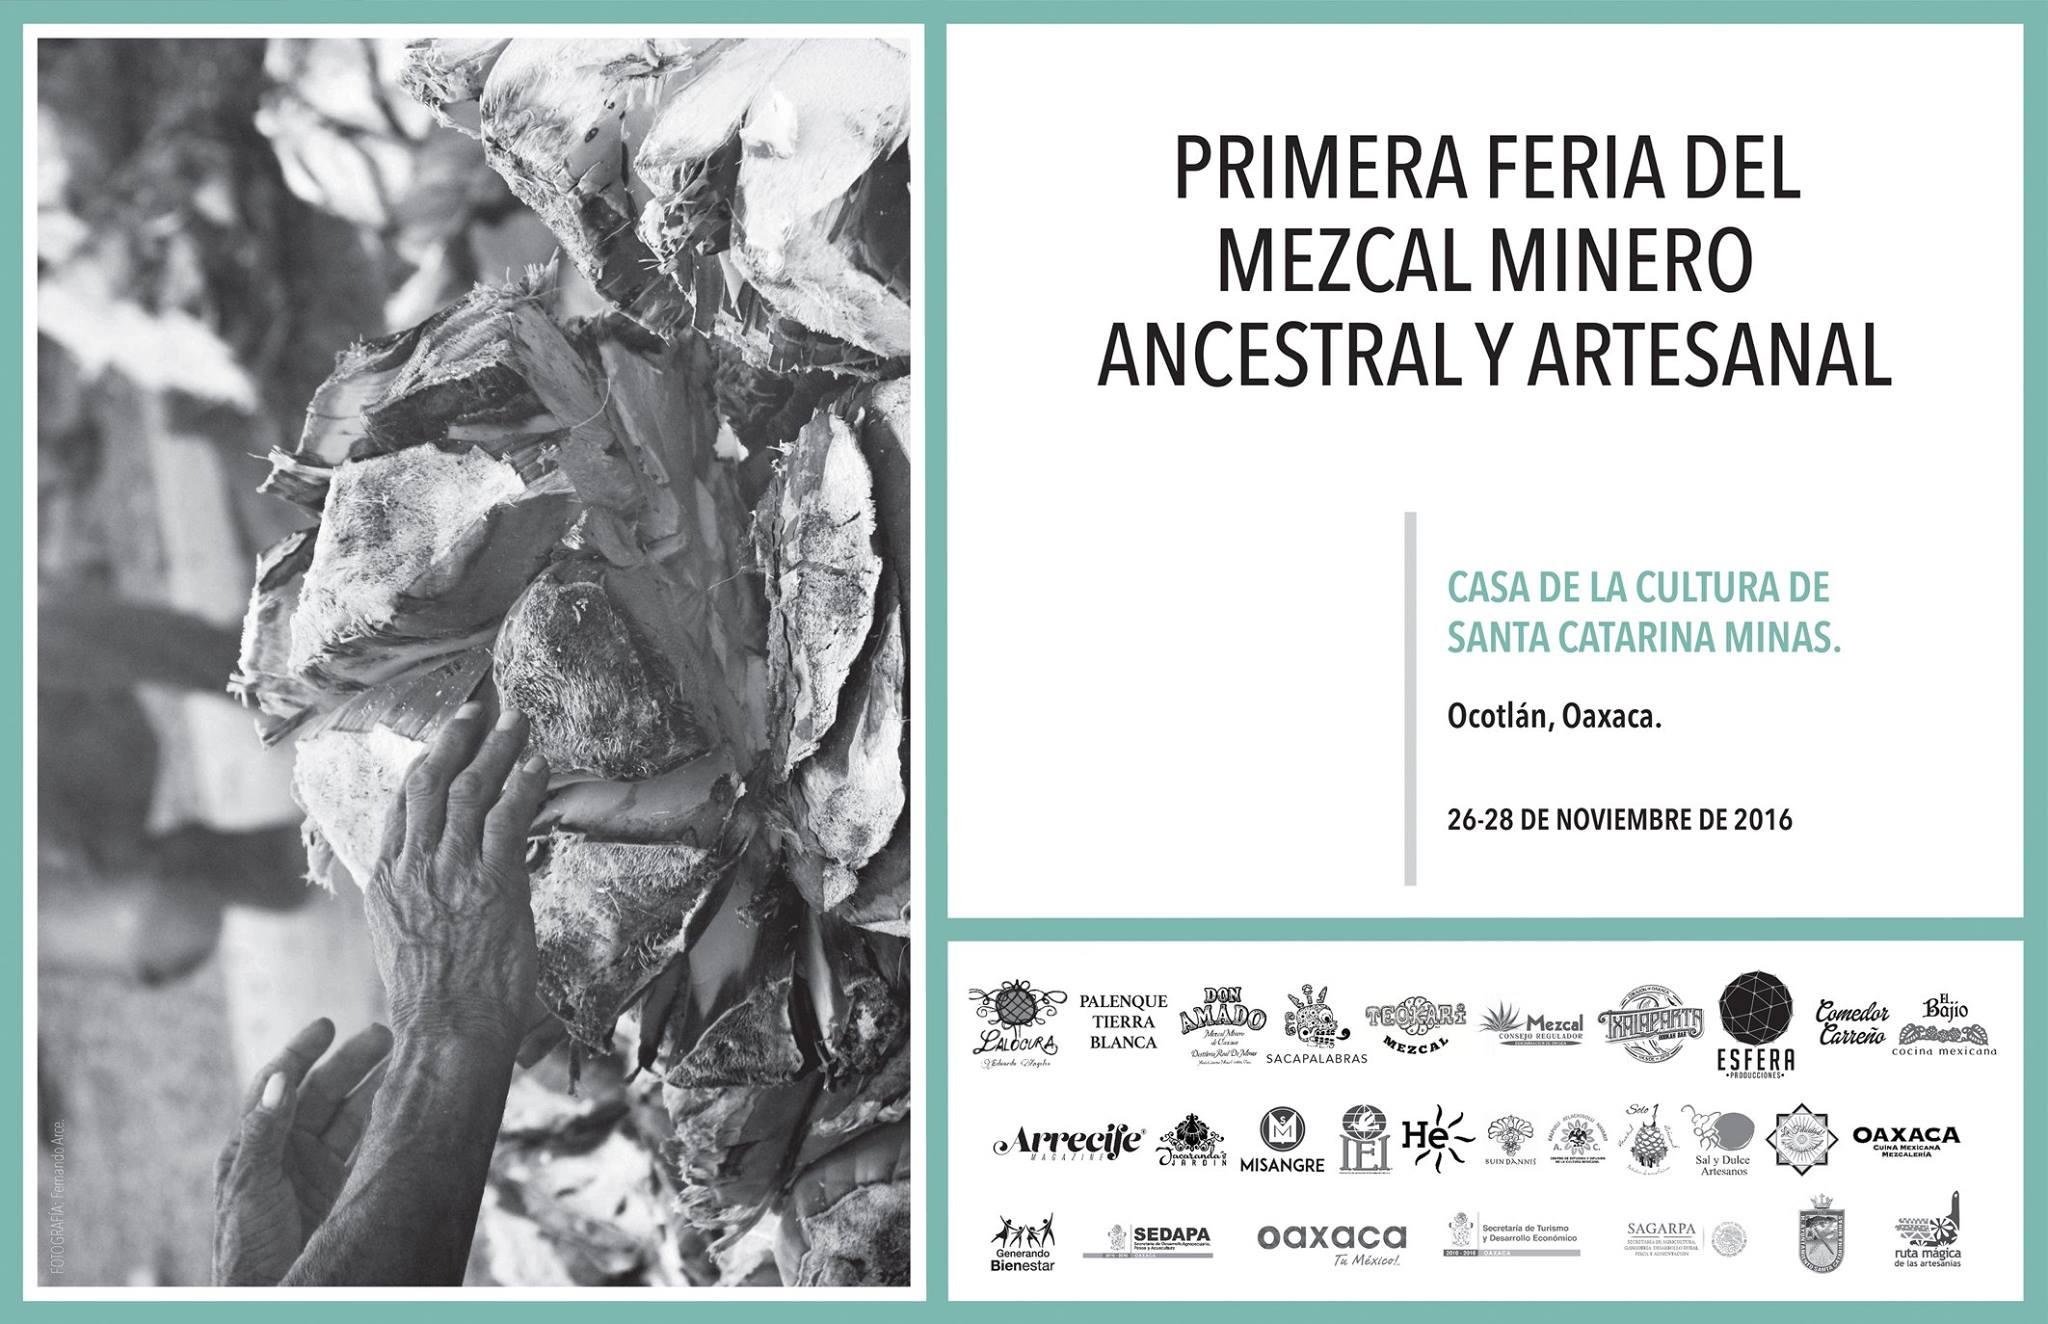 Primera Feria del Mezcal Minero Ancestral y Artesanal, Oaxaca (PROGRAMA)